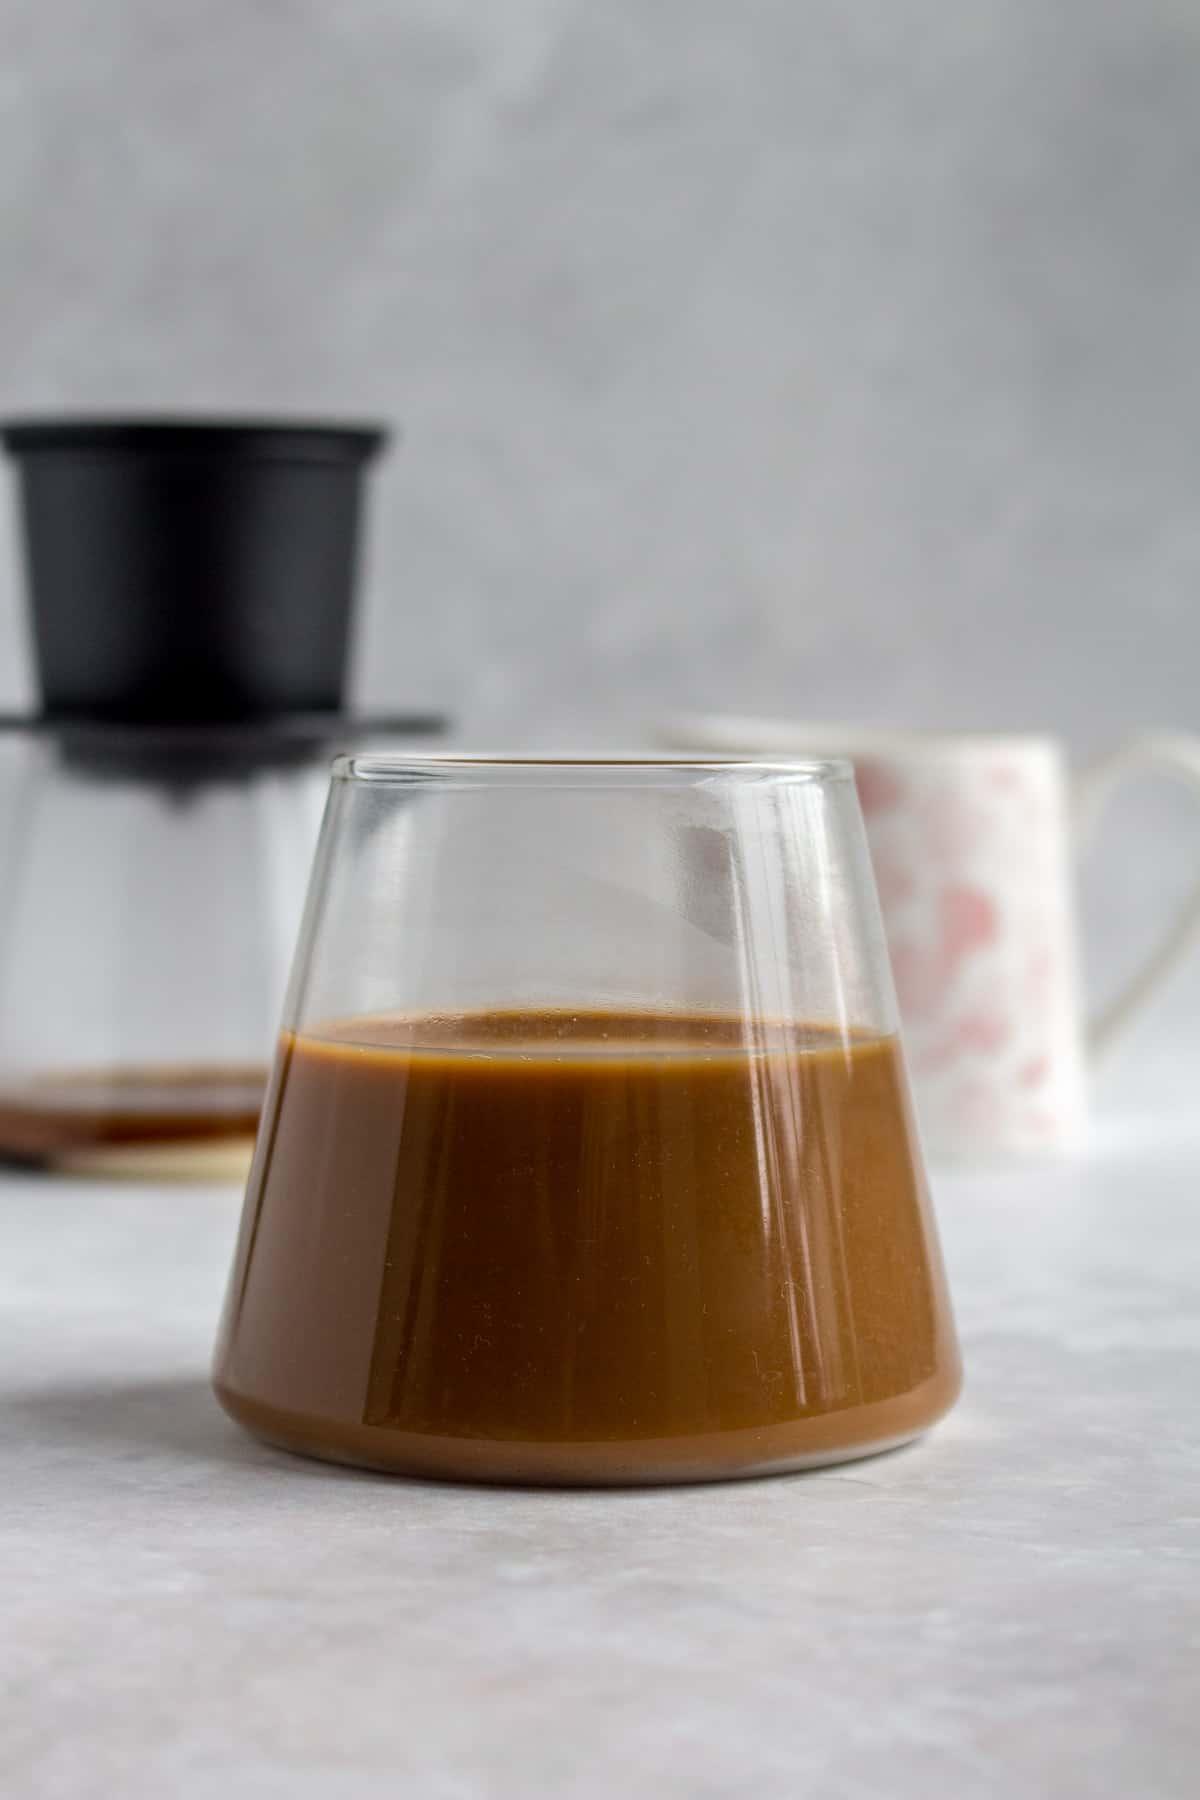 A glass of Vietnamese coffee.